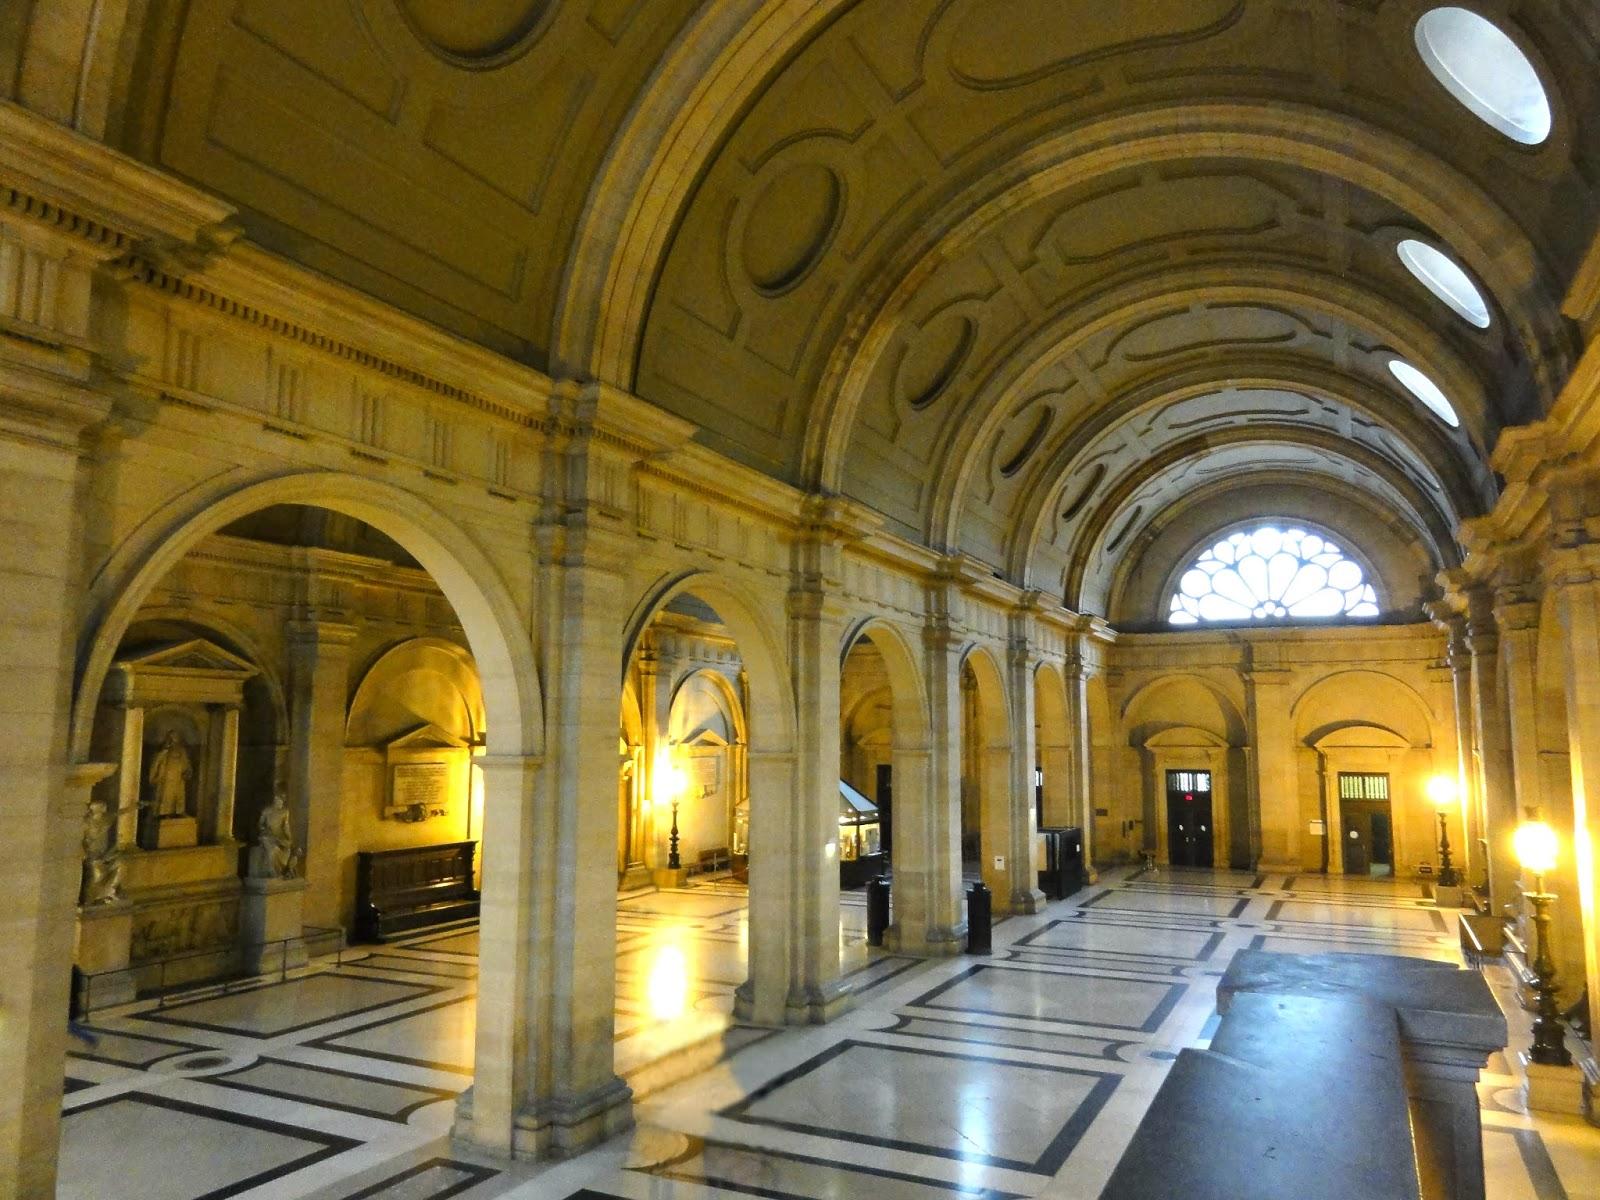 Visite Cour de Cassation - AVIAM RHONE ALPES AUVERGNE